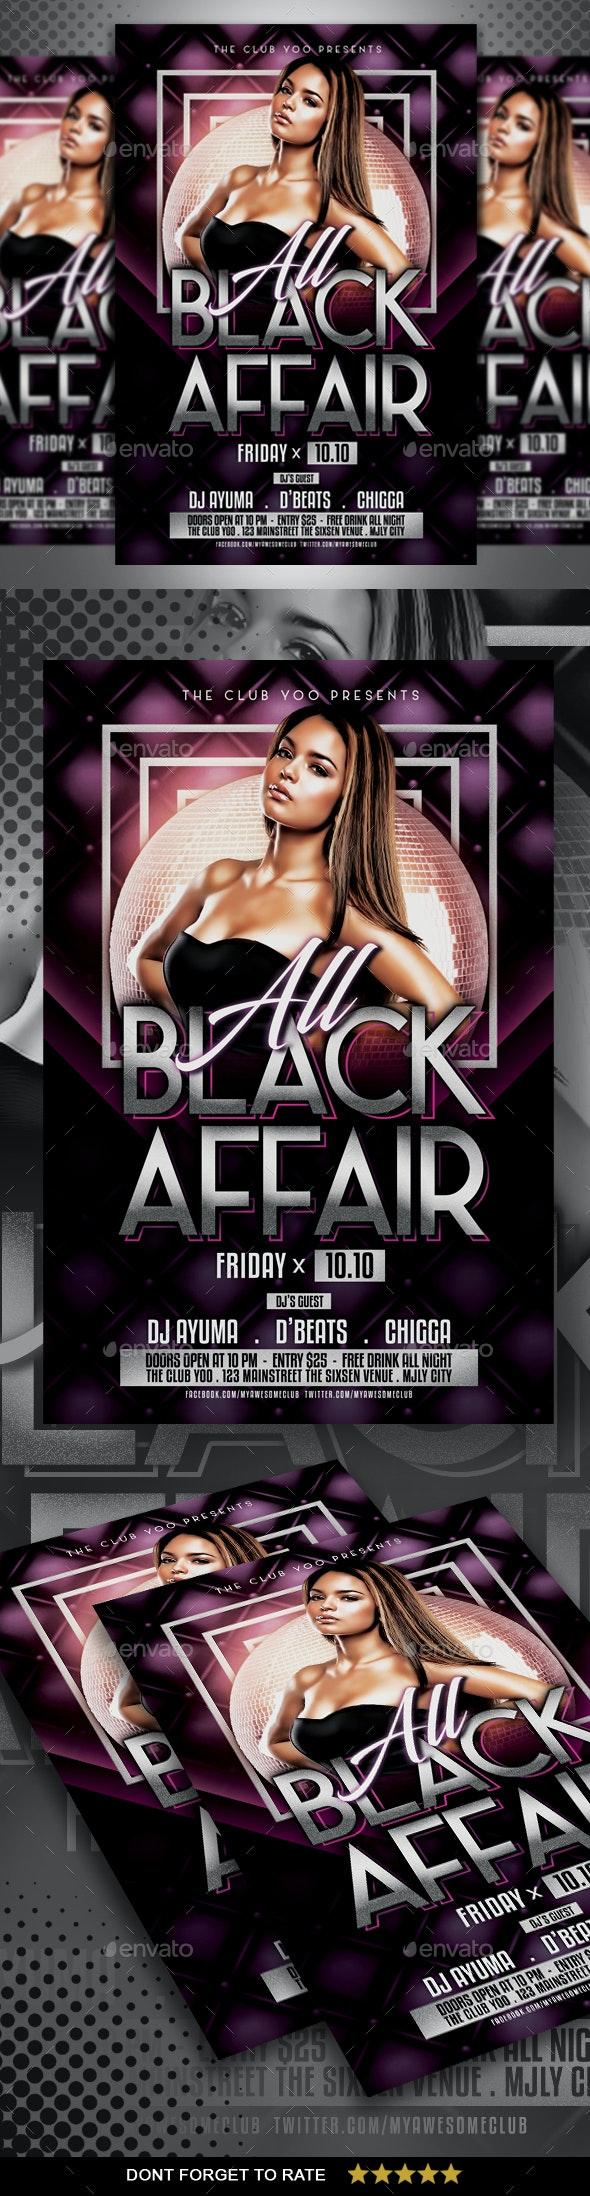 Black Affair Flyer - Clubs & Parties Events